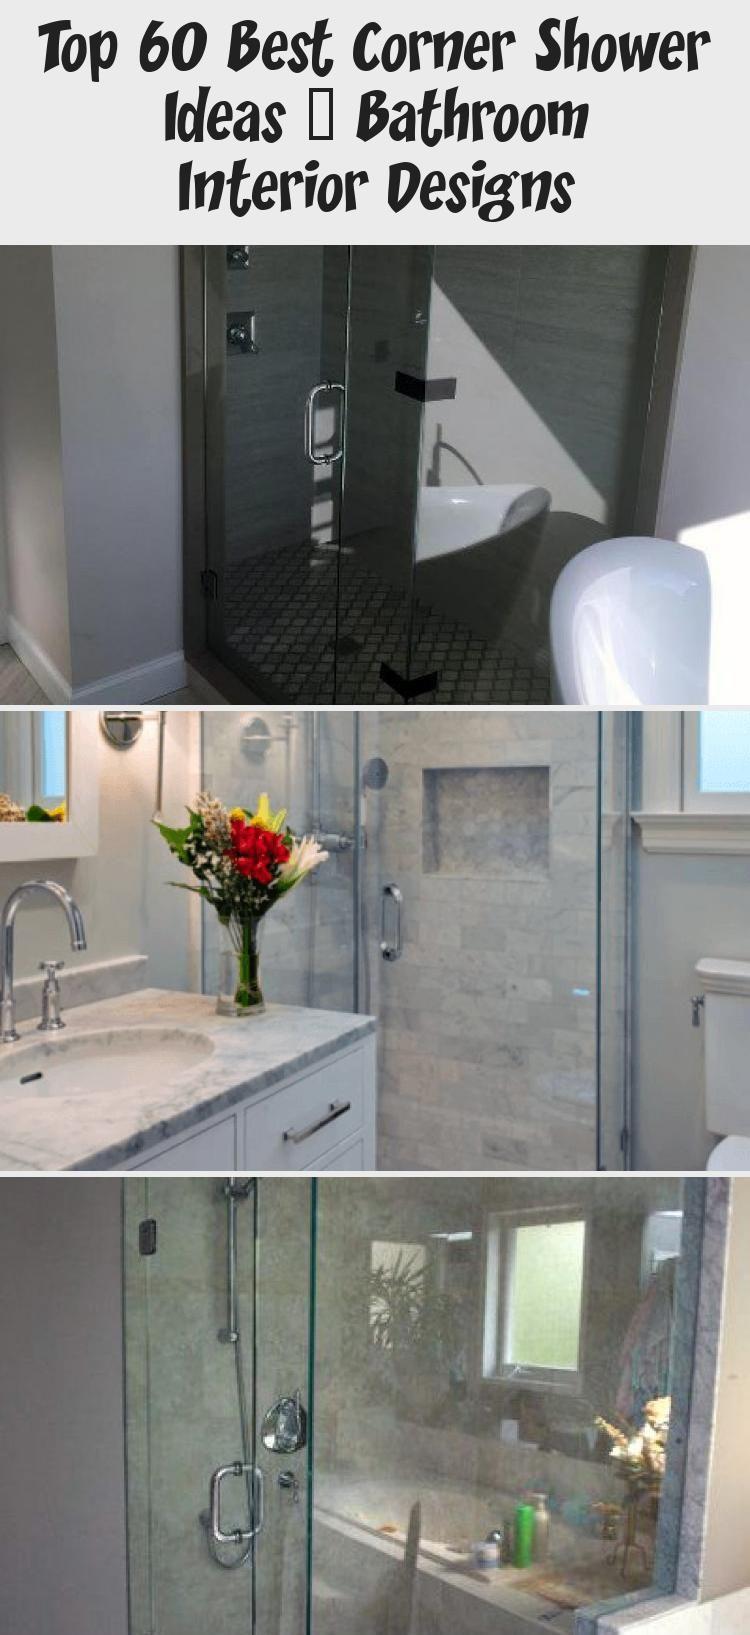 Top 60 Besten Eckdusche Ideen Badezimmer Interior Designs Home Design In 2020 Corner Shower Bathroom Interior Design Bathroom Interior